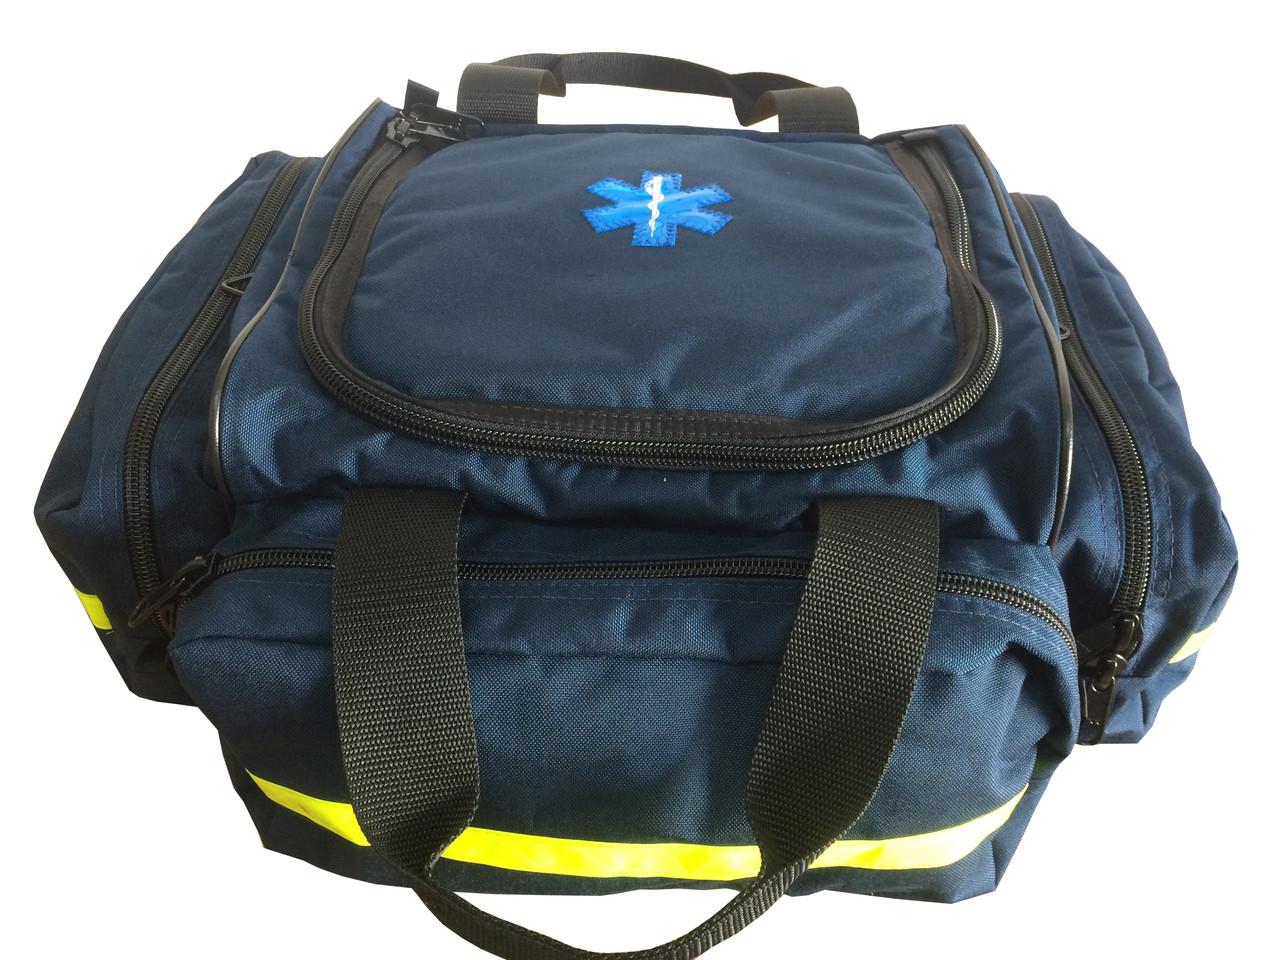 Stocked - Tri-Pocket Responder Bag - Navy or Orange